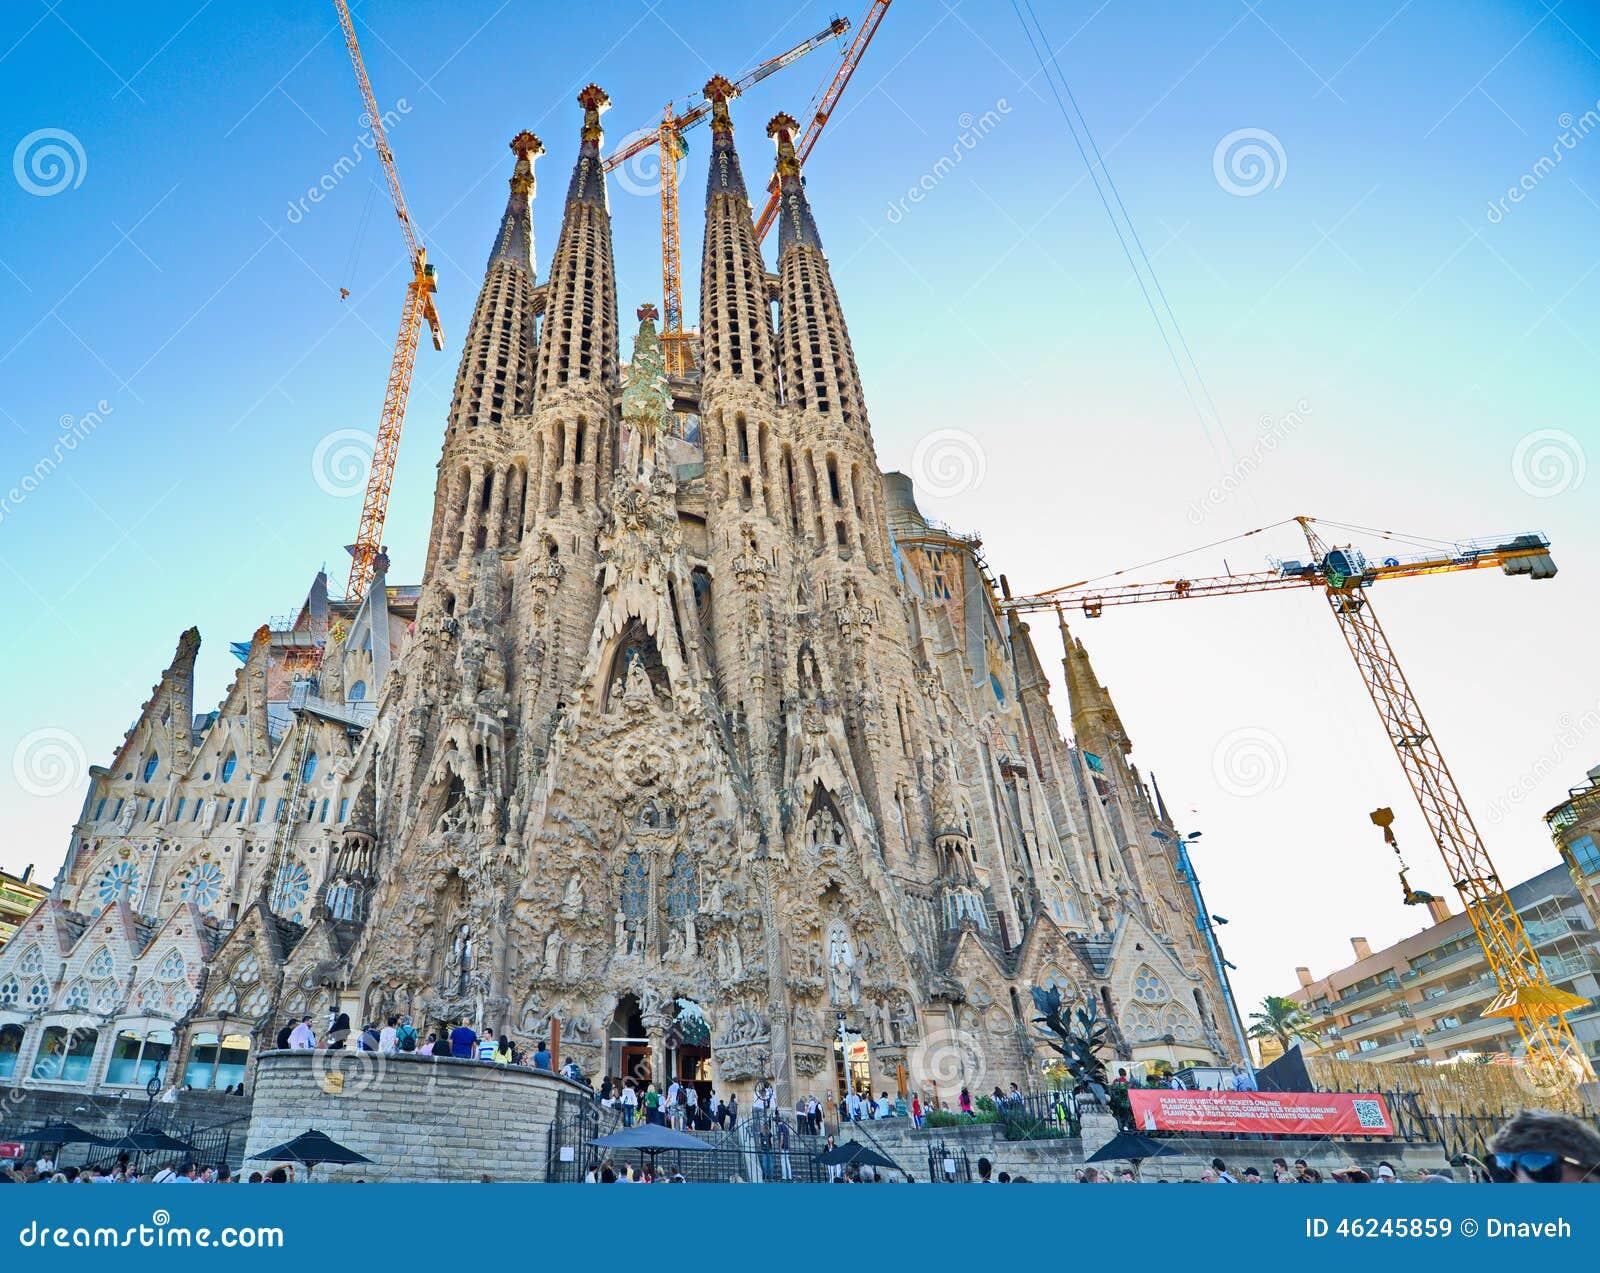 The basilica de la sagrada familia barcelona editorial for La sagrada familia church